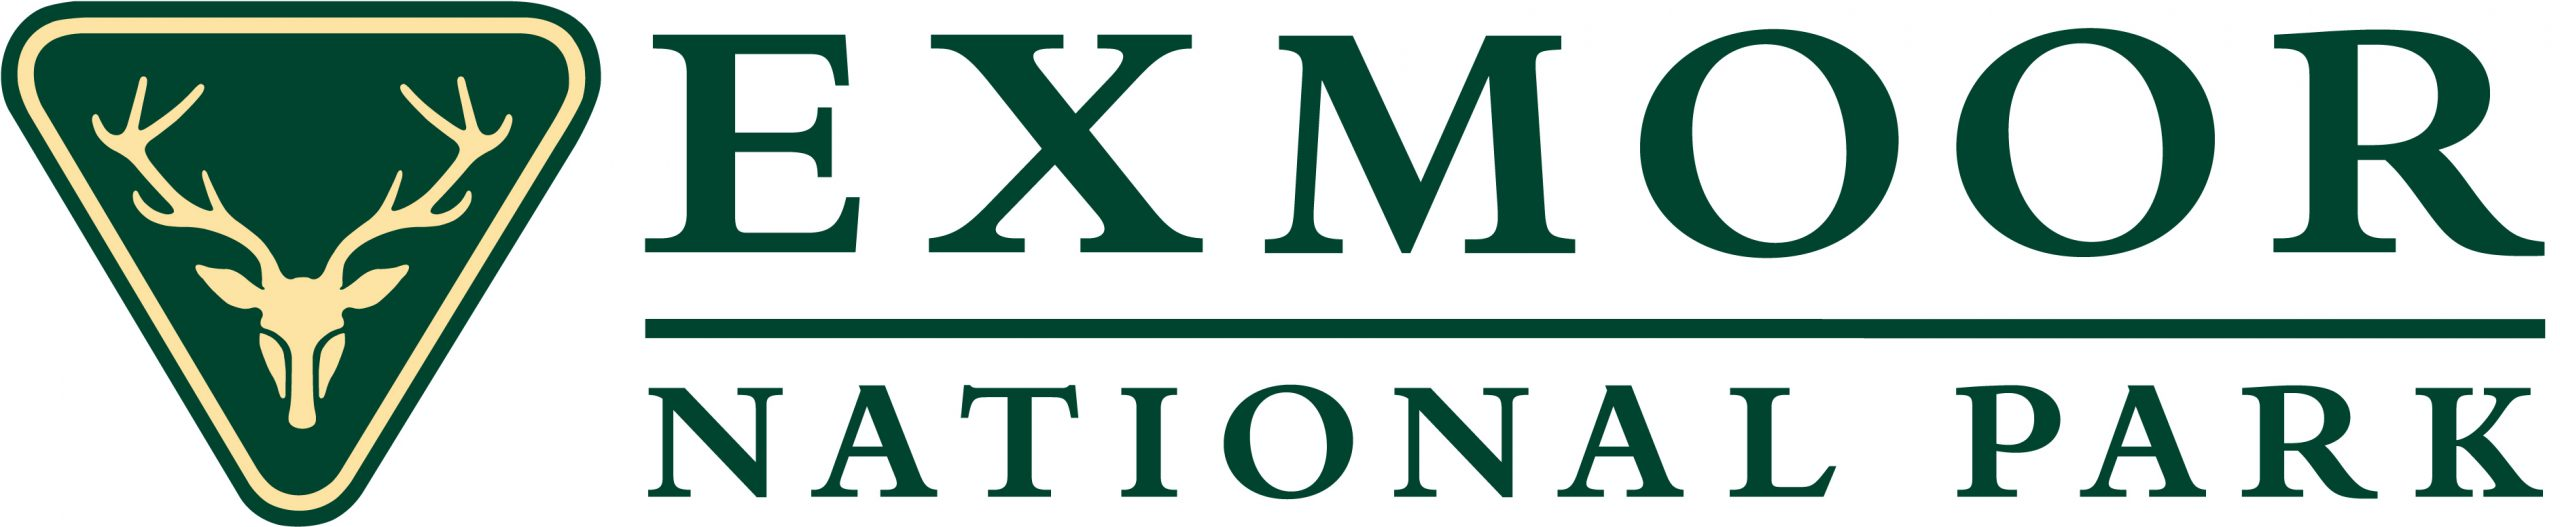 RGB_Landscape Logo_Exmoor